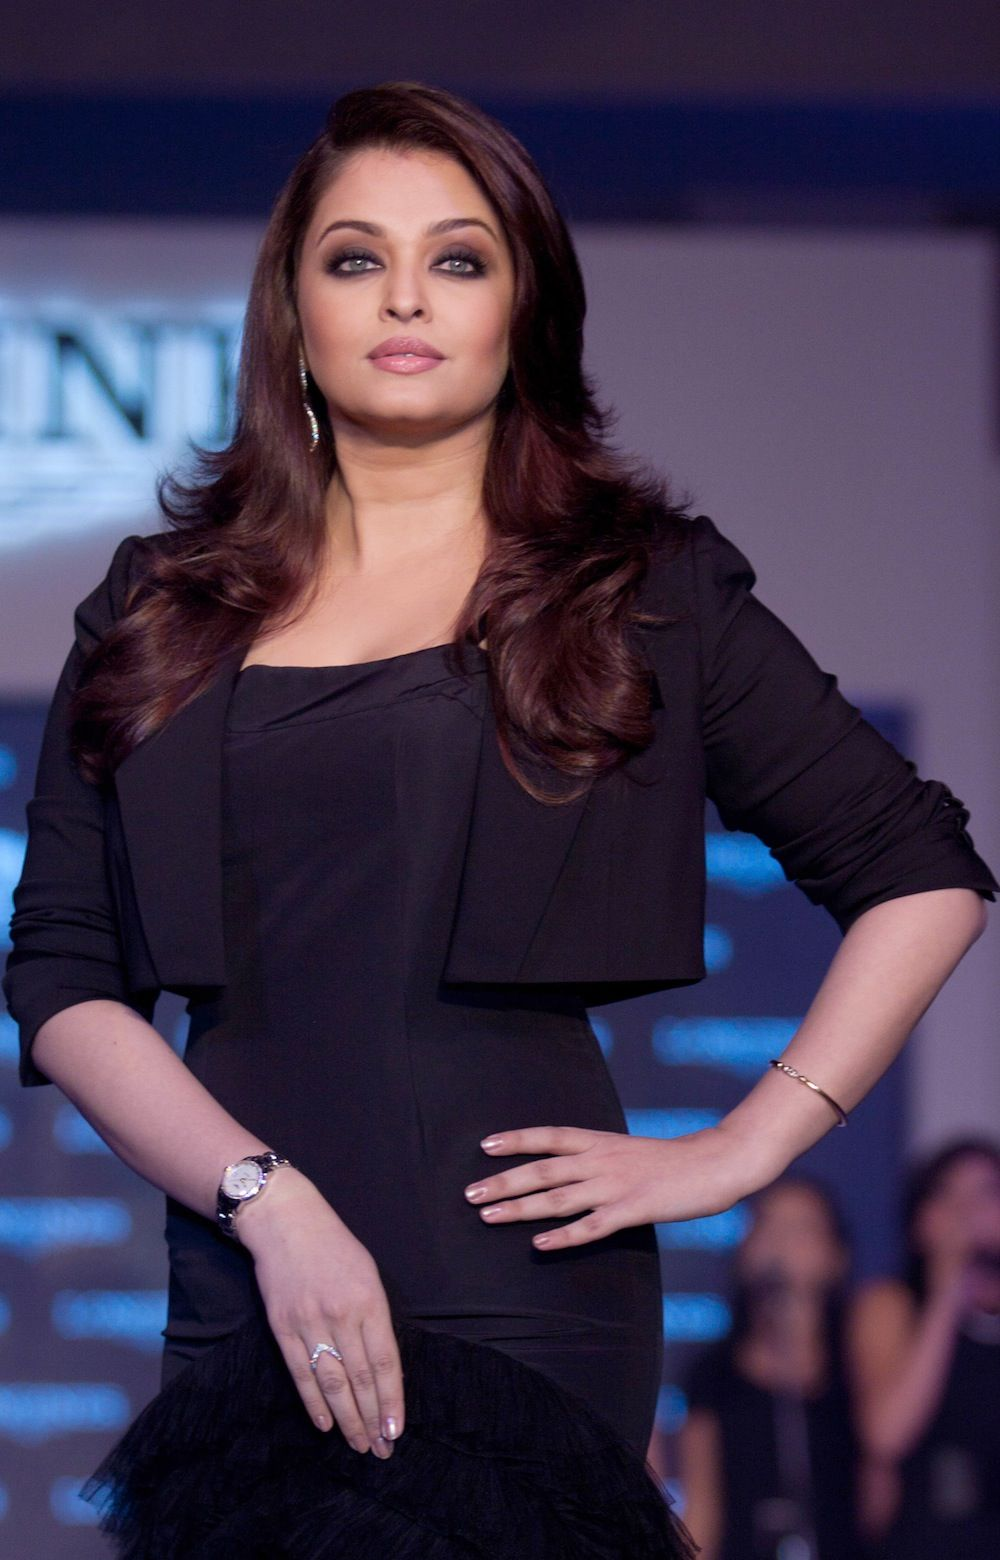 Lovely Aishwarya Rai Aishwarya Rai Photo Aishwarya Rai Bachchan Beautiful Bollywood Actress